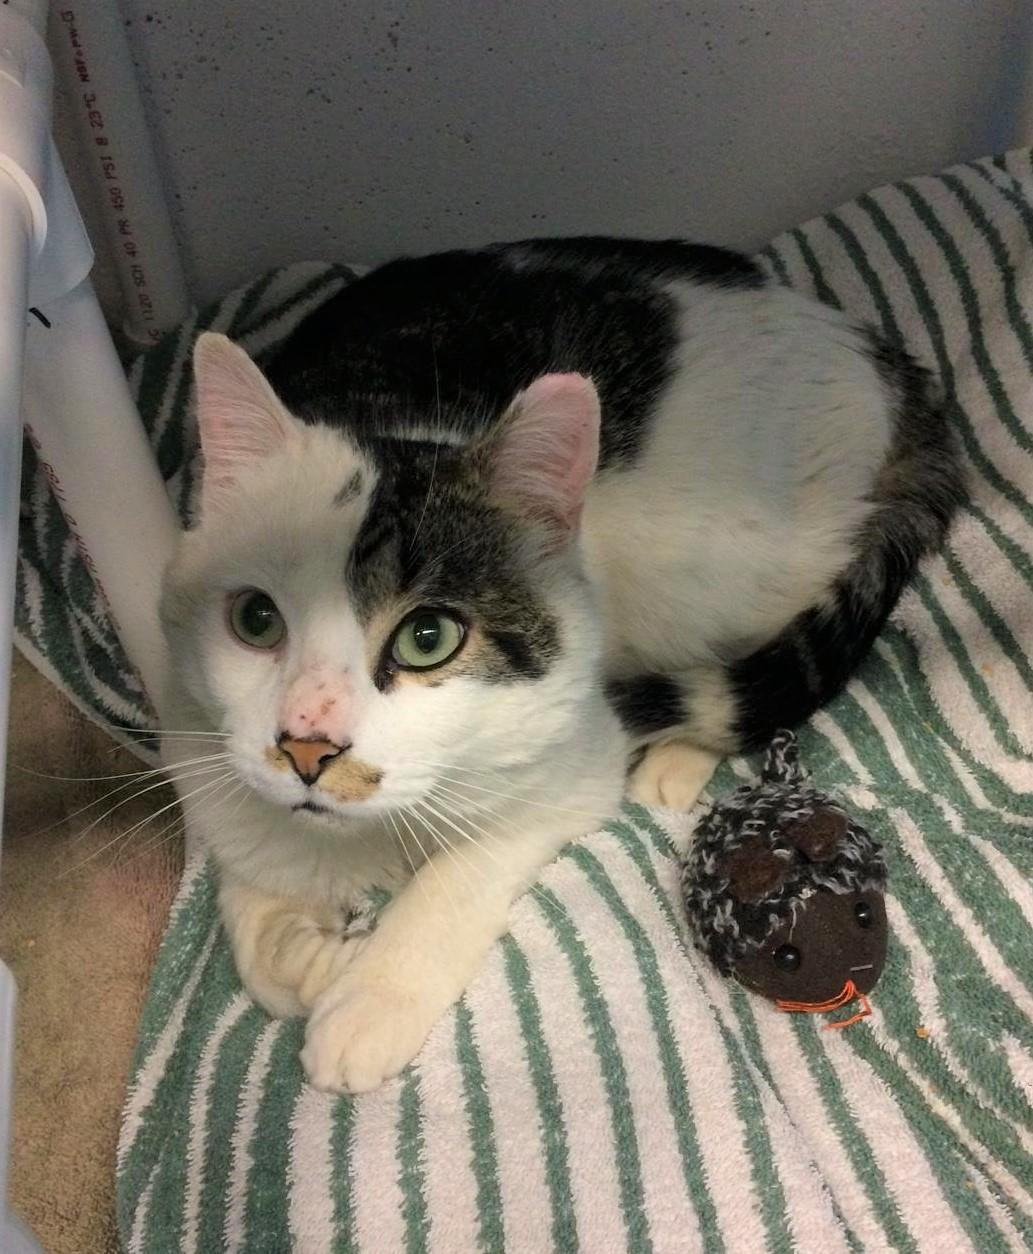 Cat for Adoption – Nori, near St. Albans, VT | Petfinder